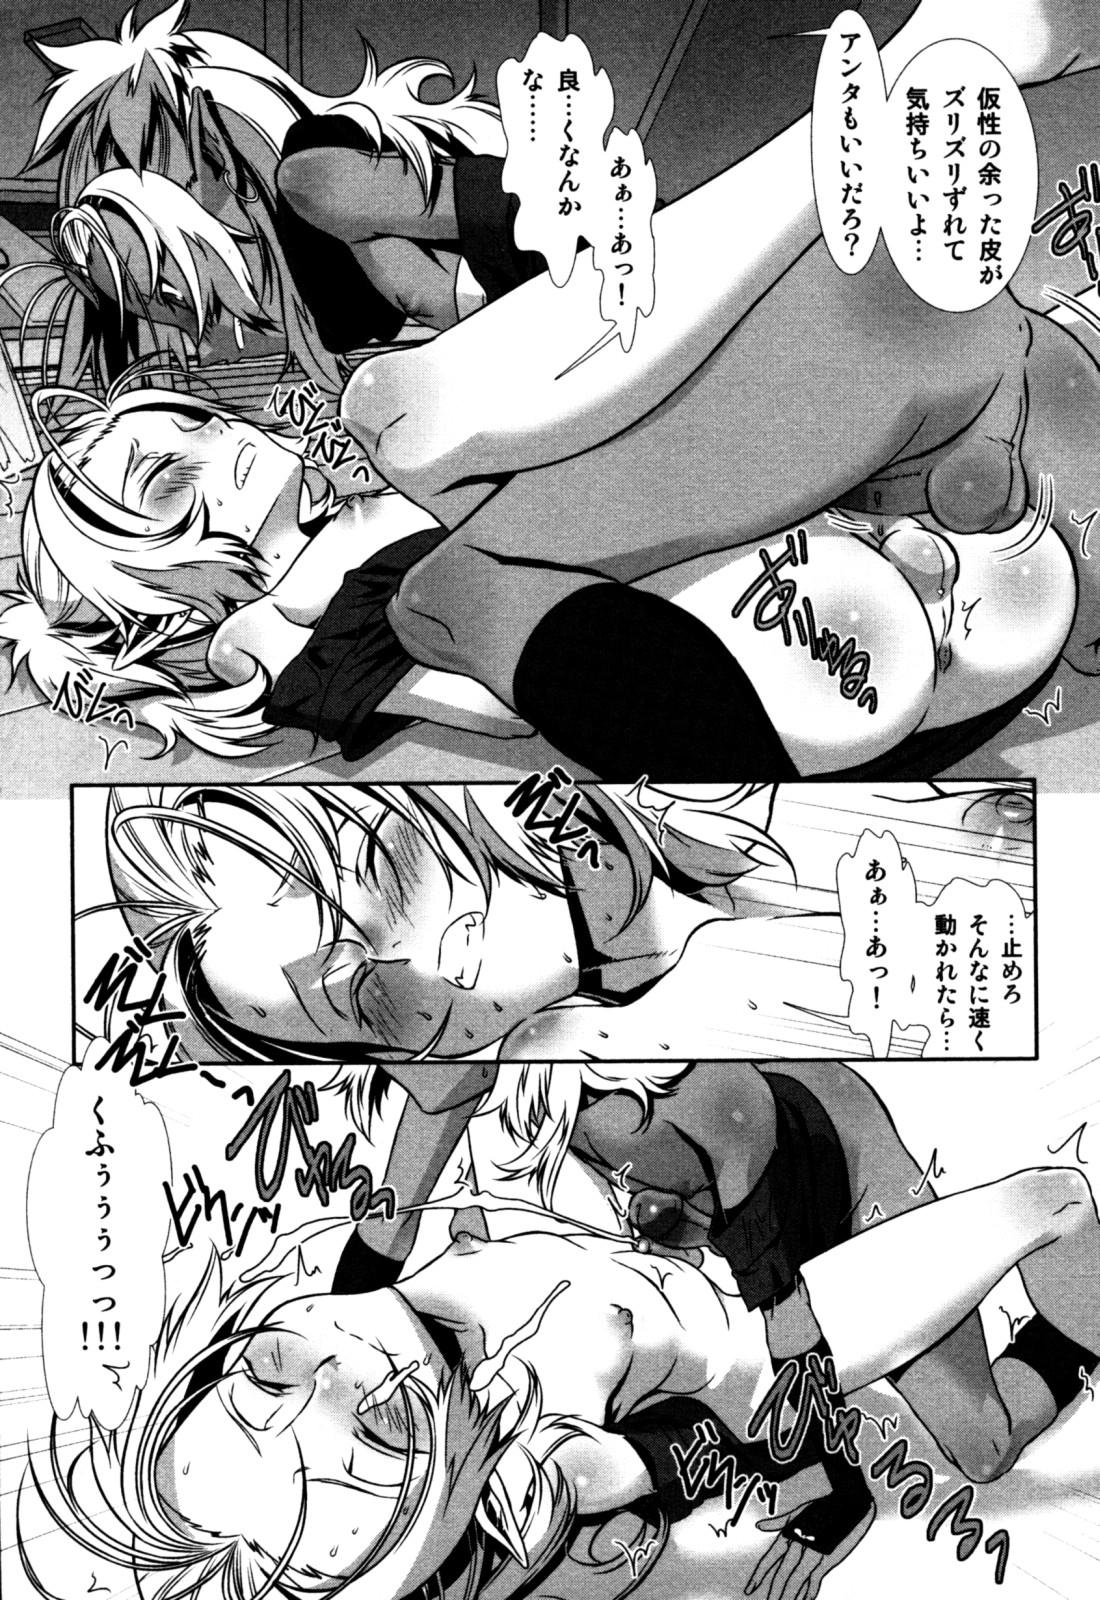 Eros Boys - Ero Shota 5 147